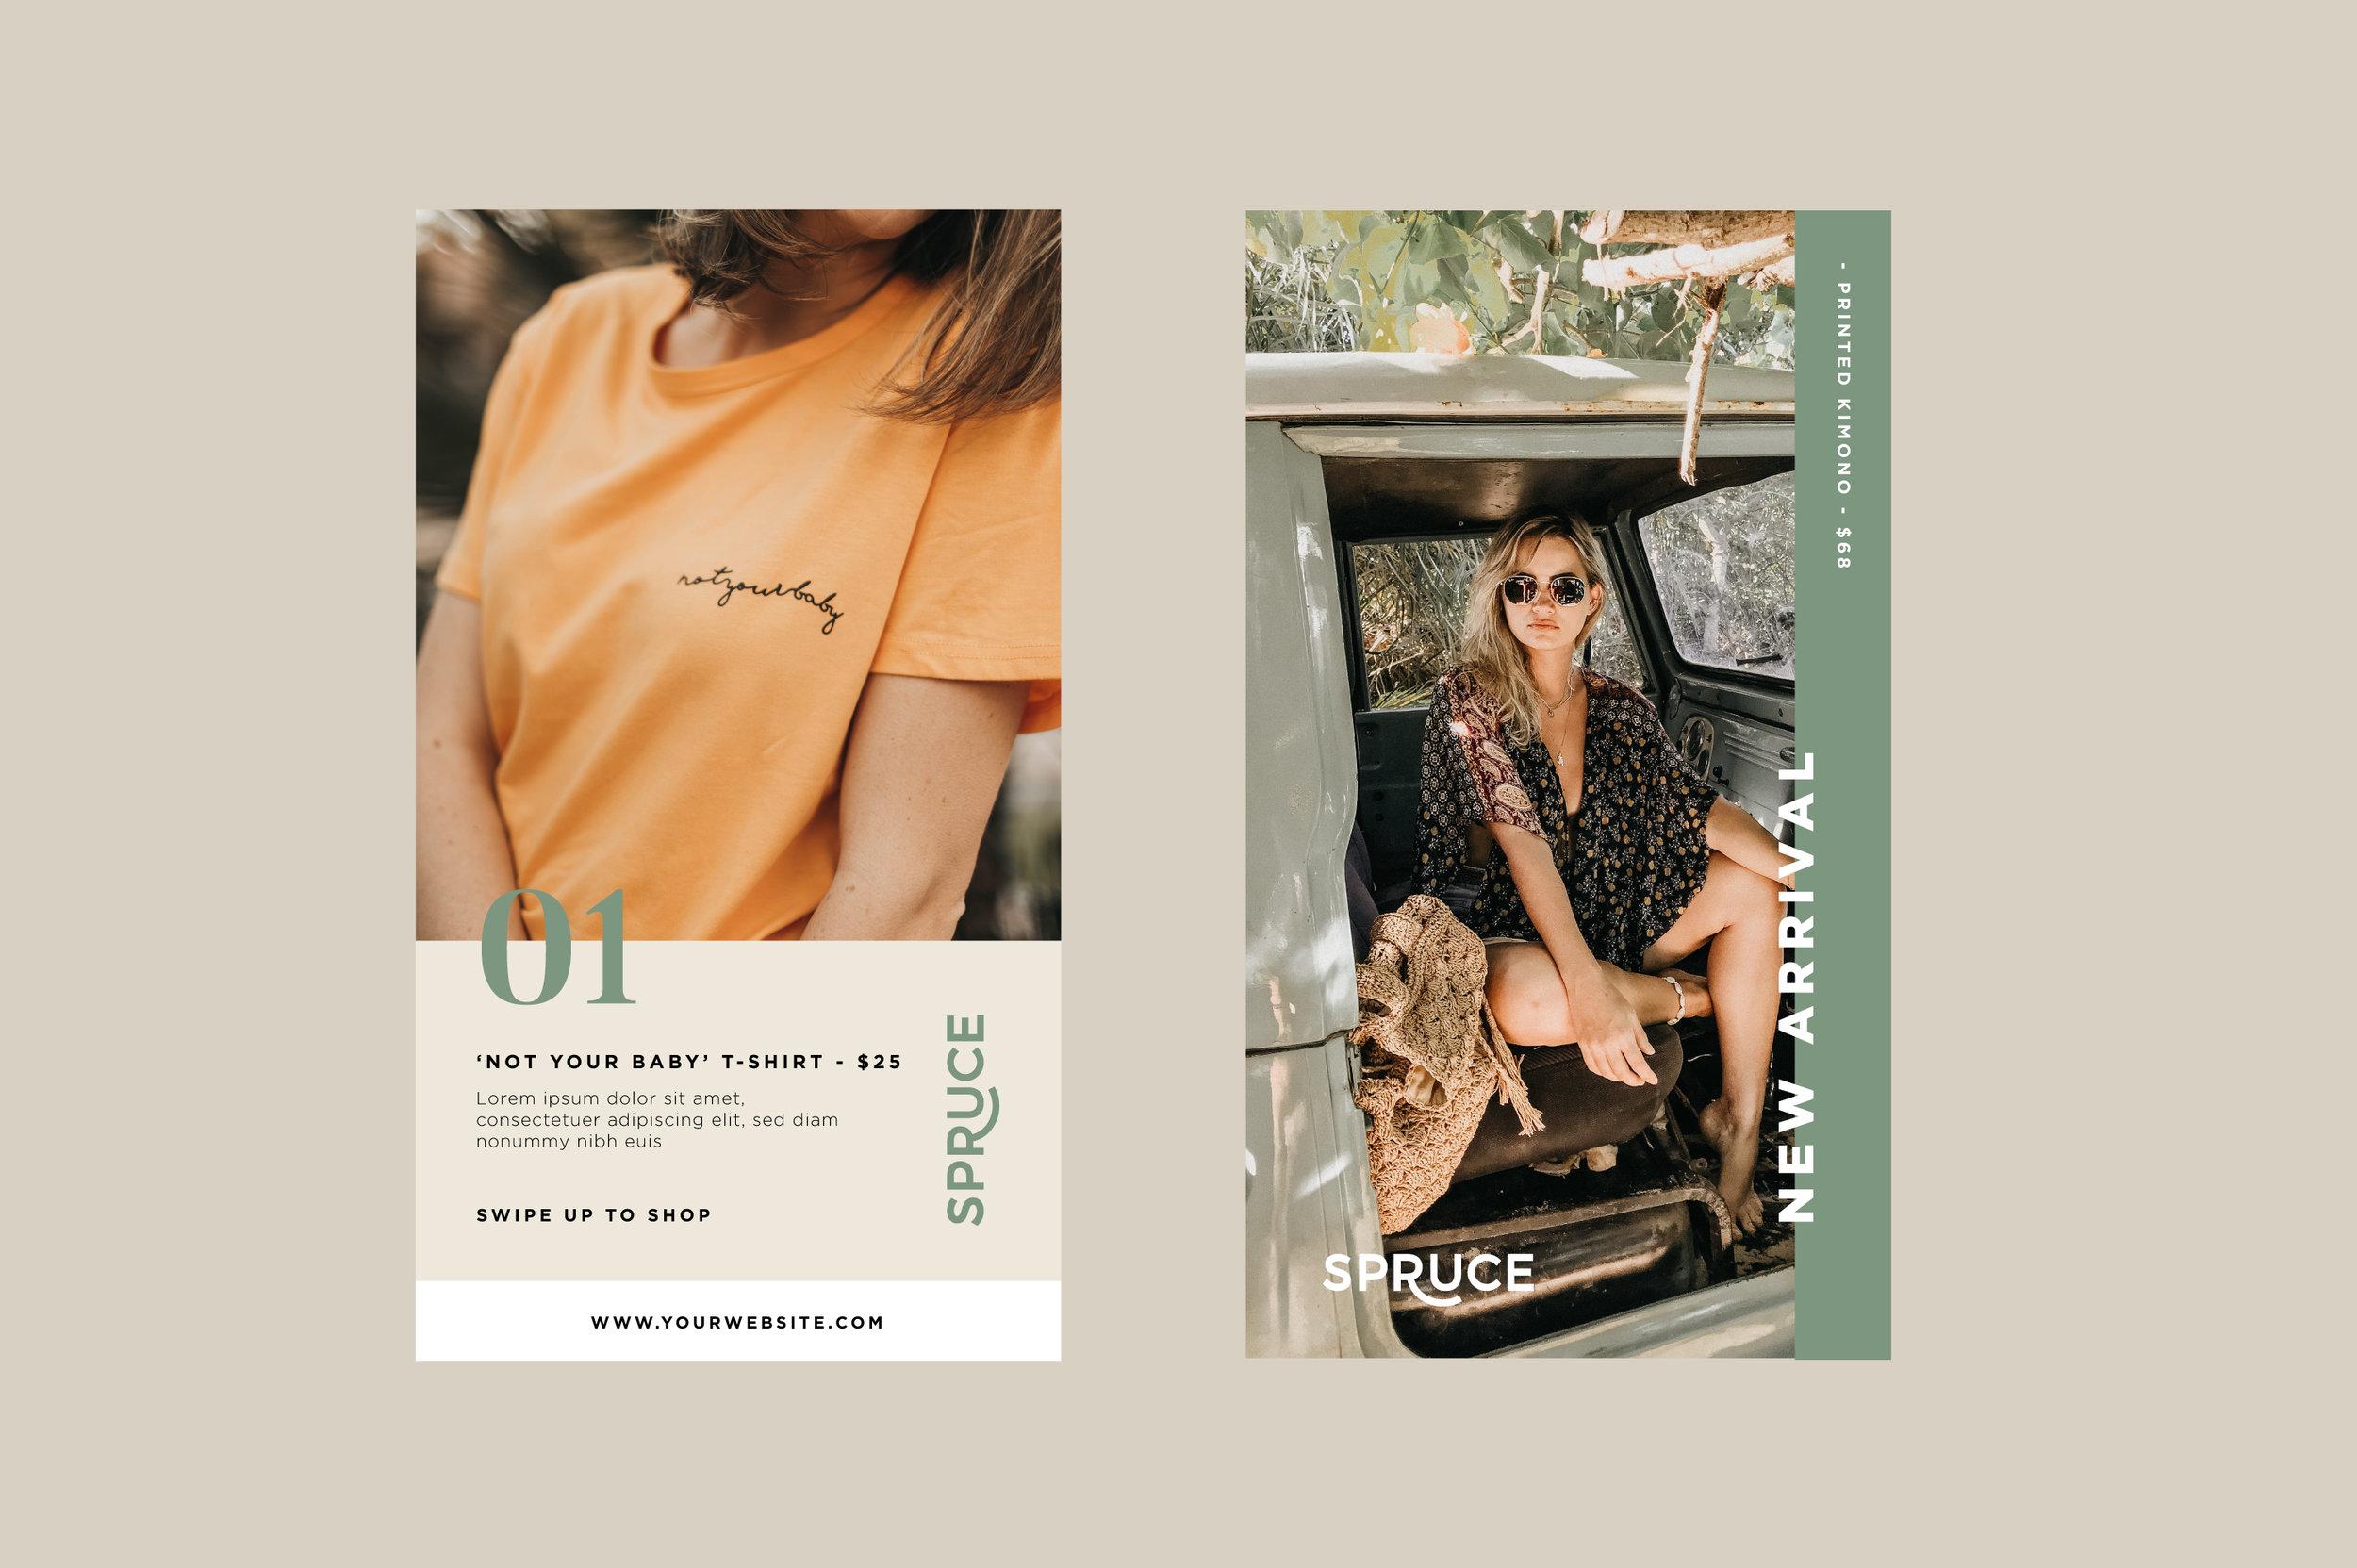 spruce-Insta-template-cover2.jpg